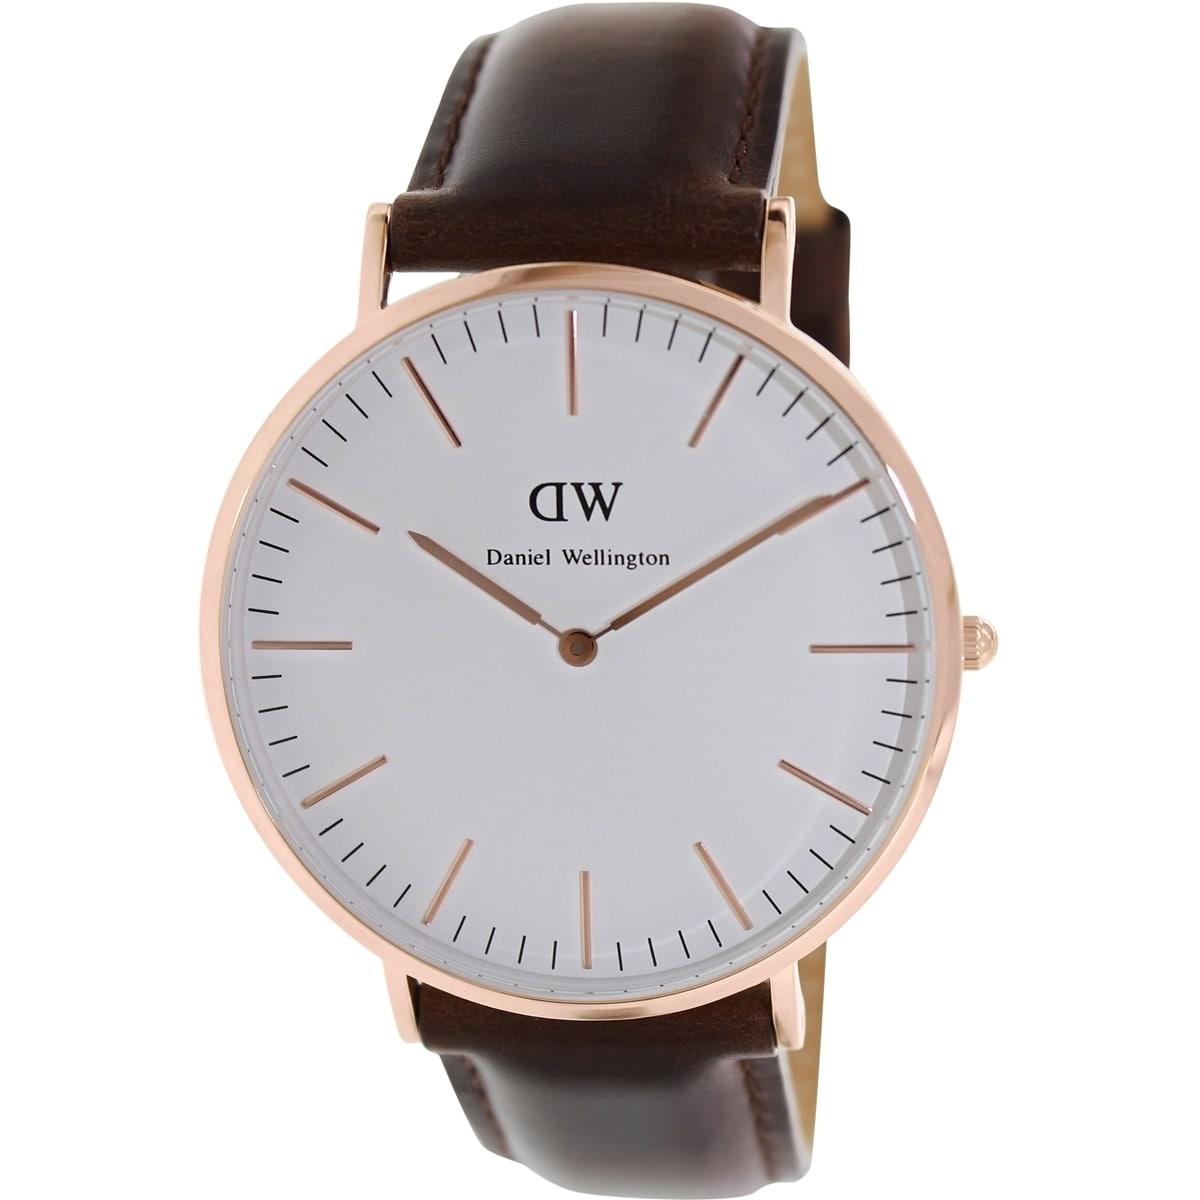 Shop Daniel Wellington Men's Bristol 0109DW White Leather Quartz Watch - Free Shipping Today - Overstock.com - 9830559